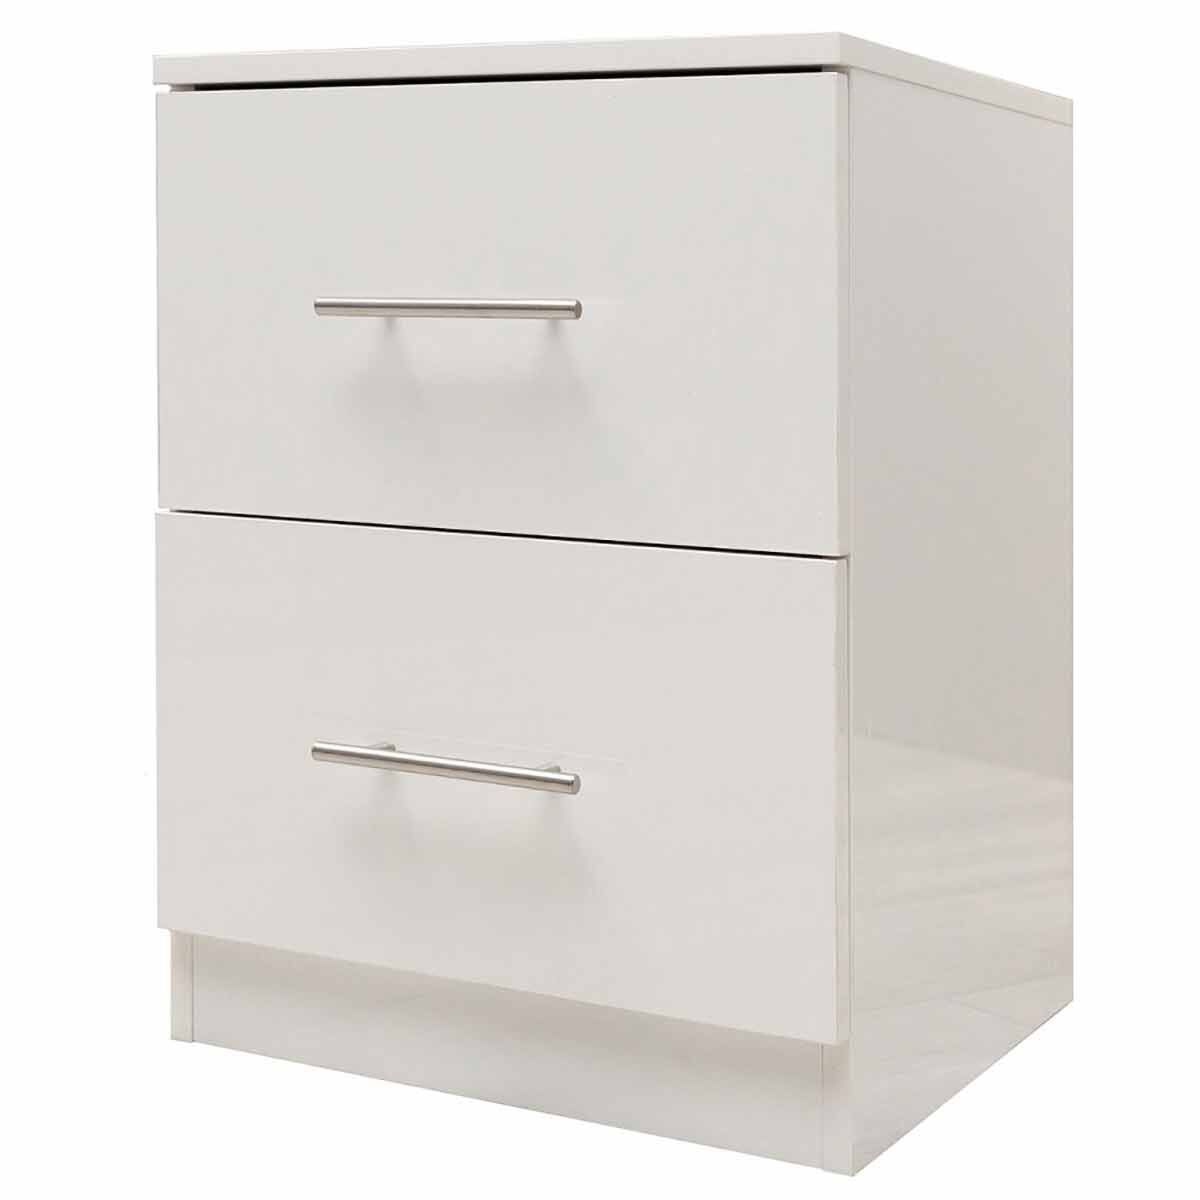 Helston Gloss 2 Drawer Bedside Cabinet White